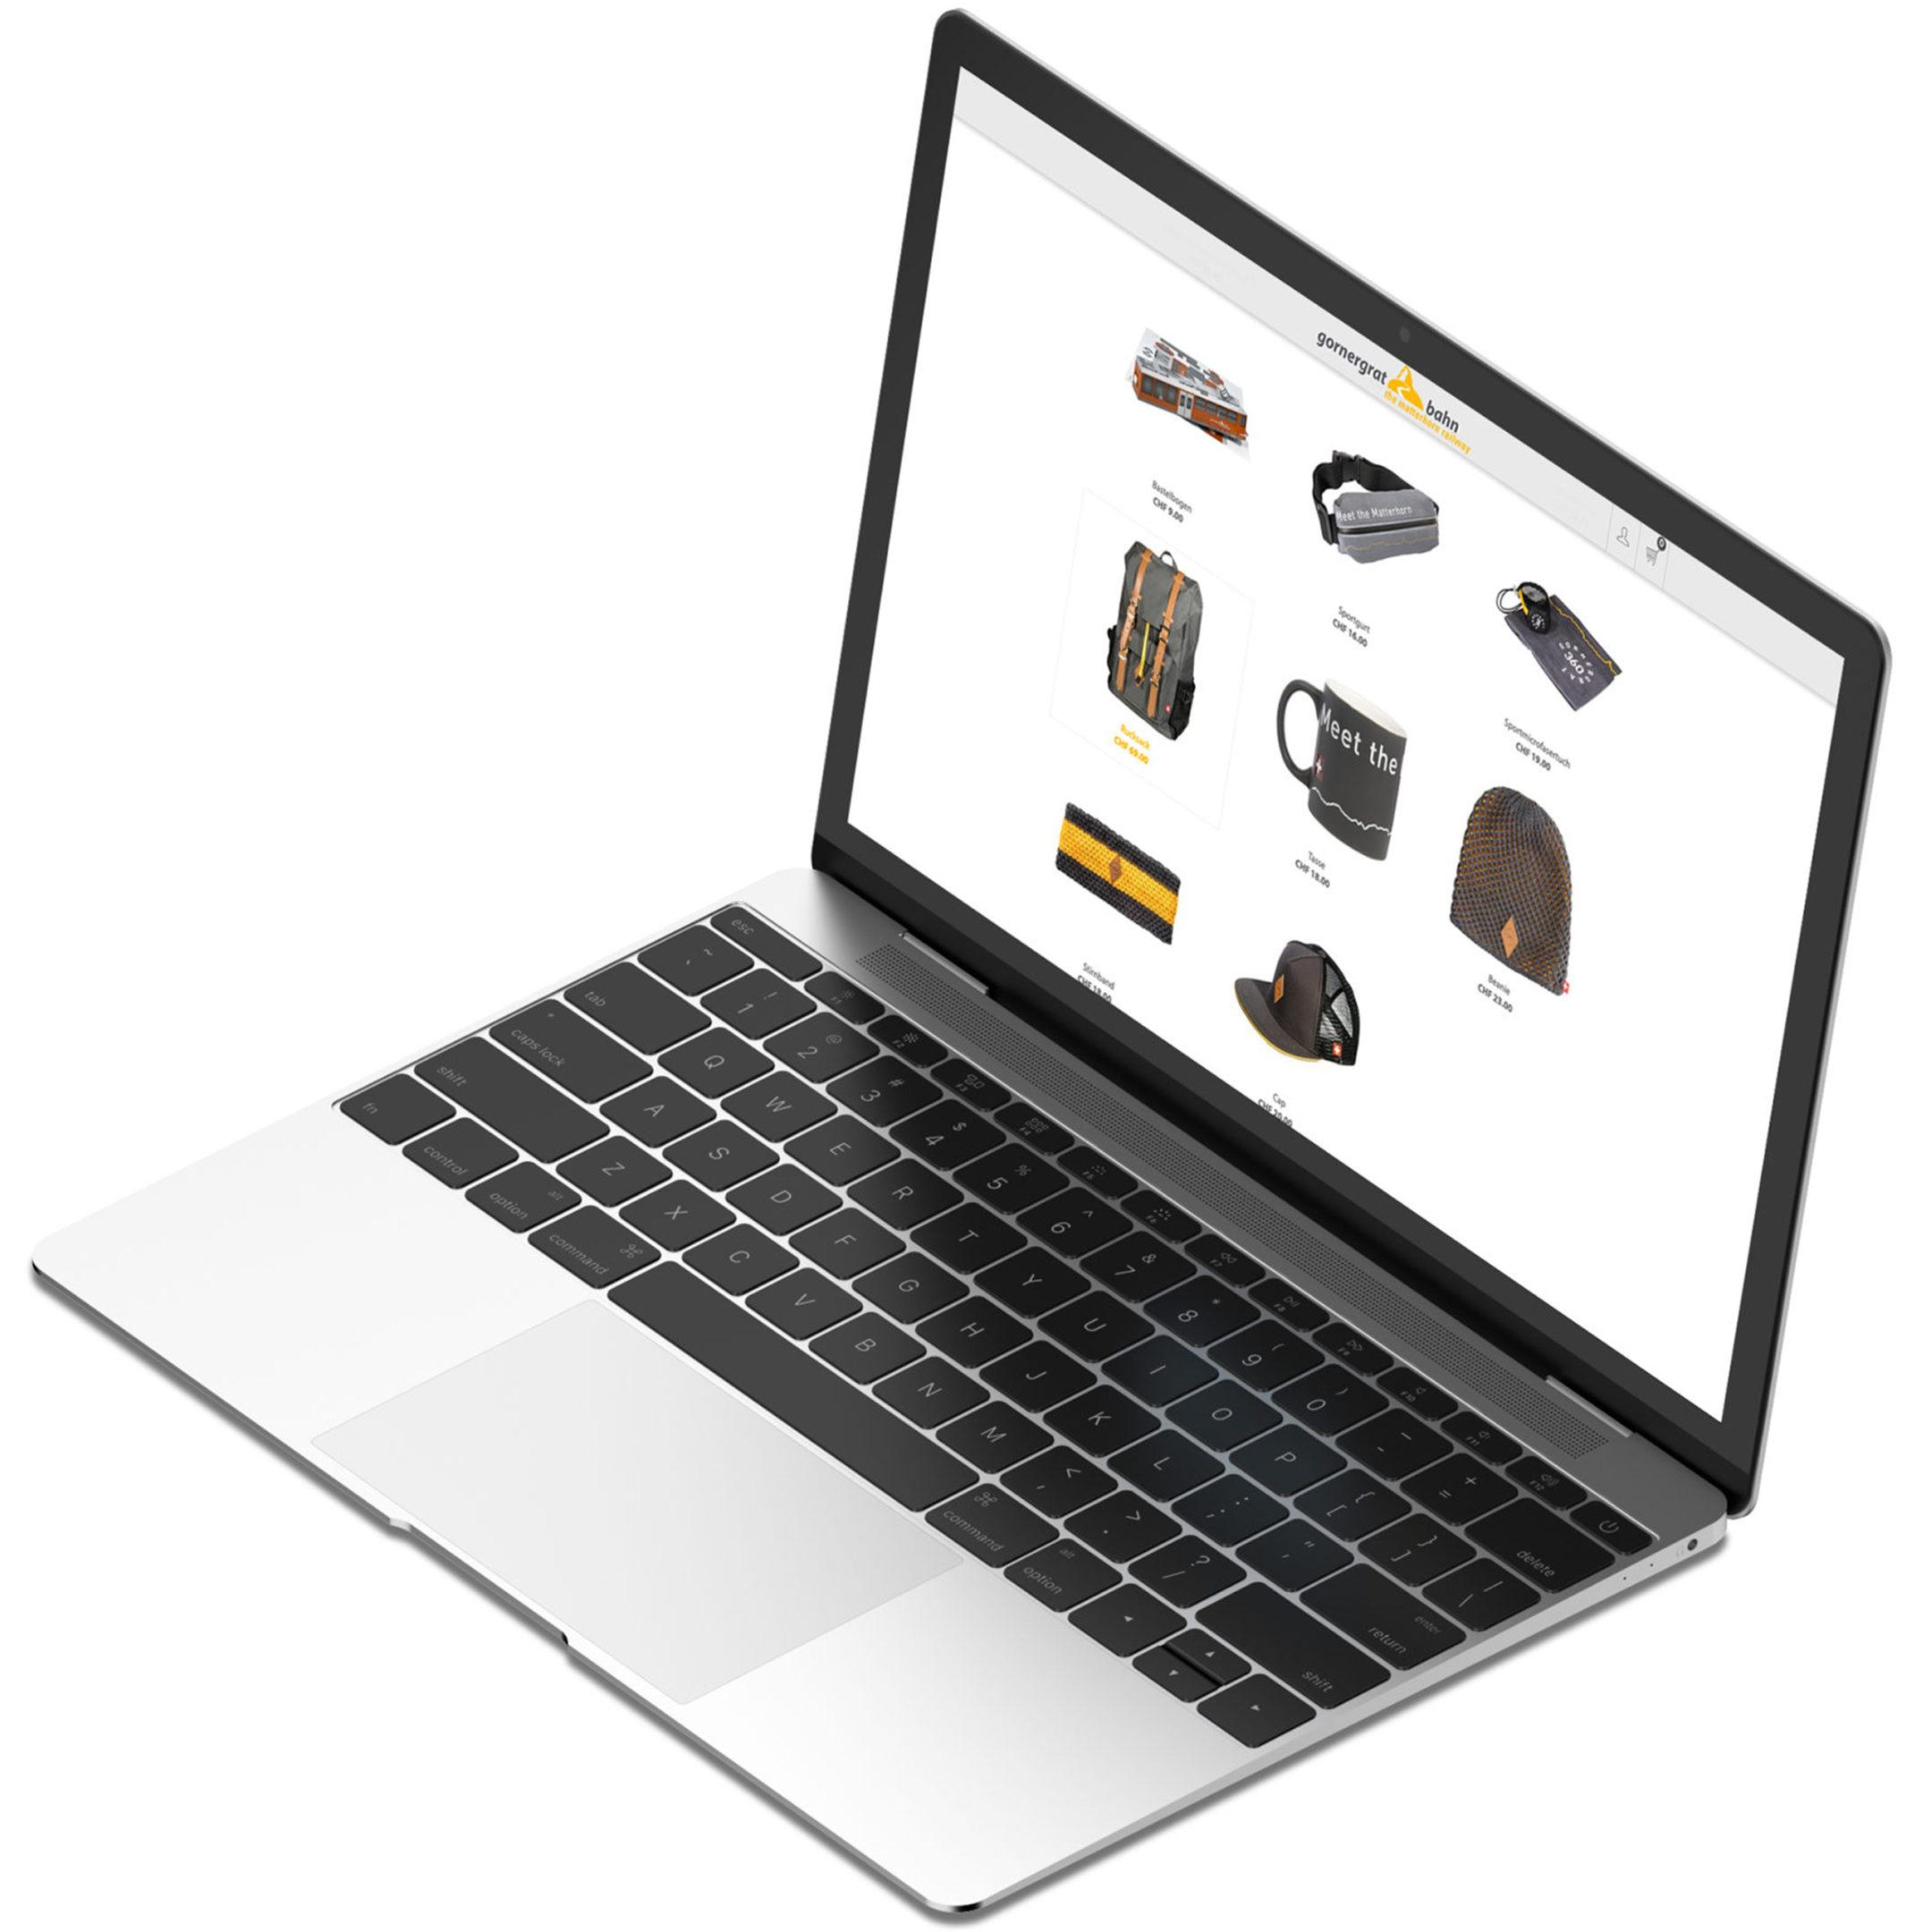 iMac Website Gornergratbahn